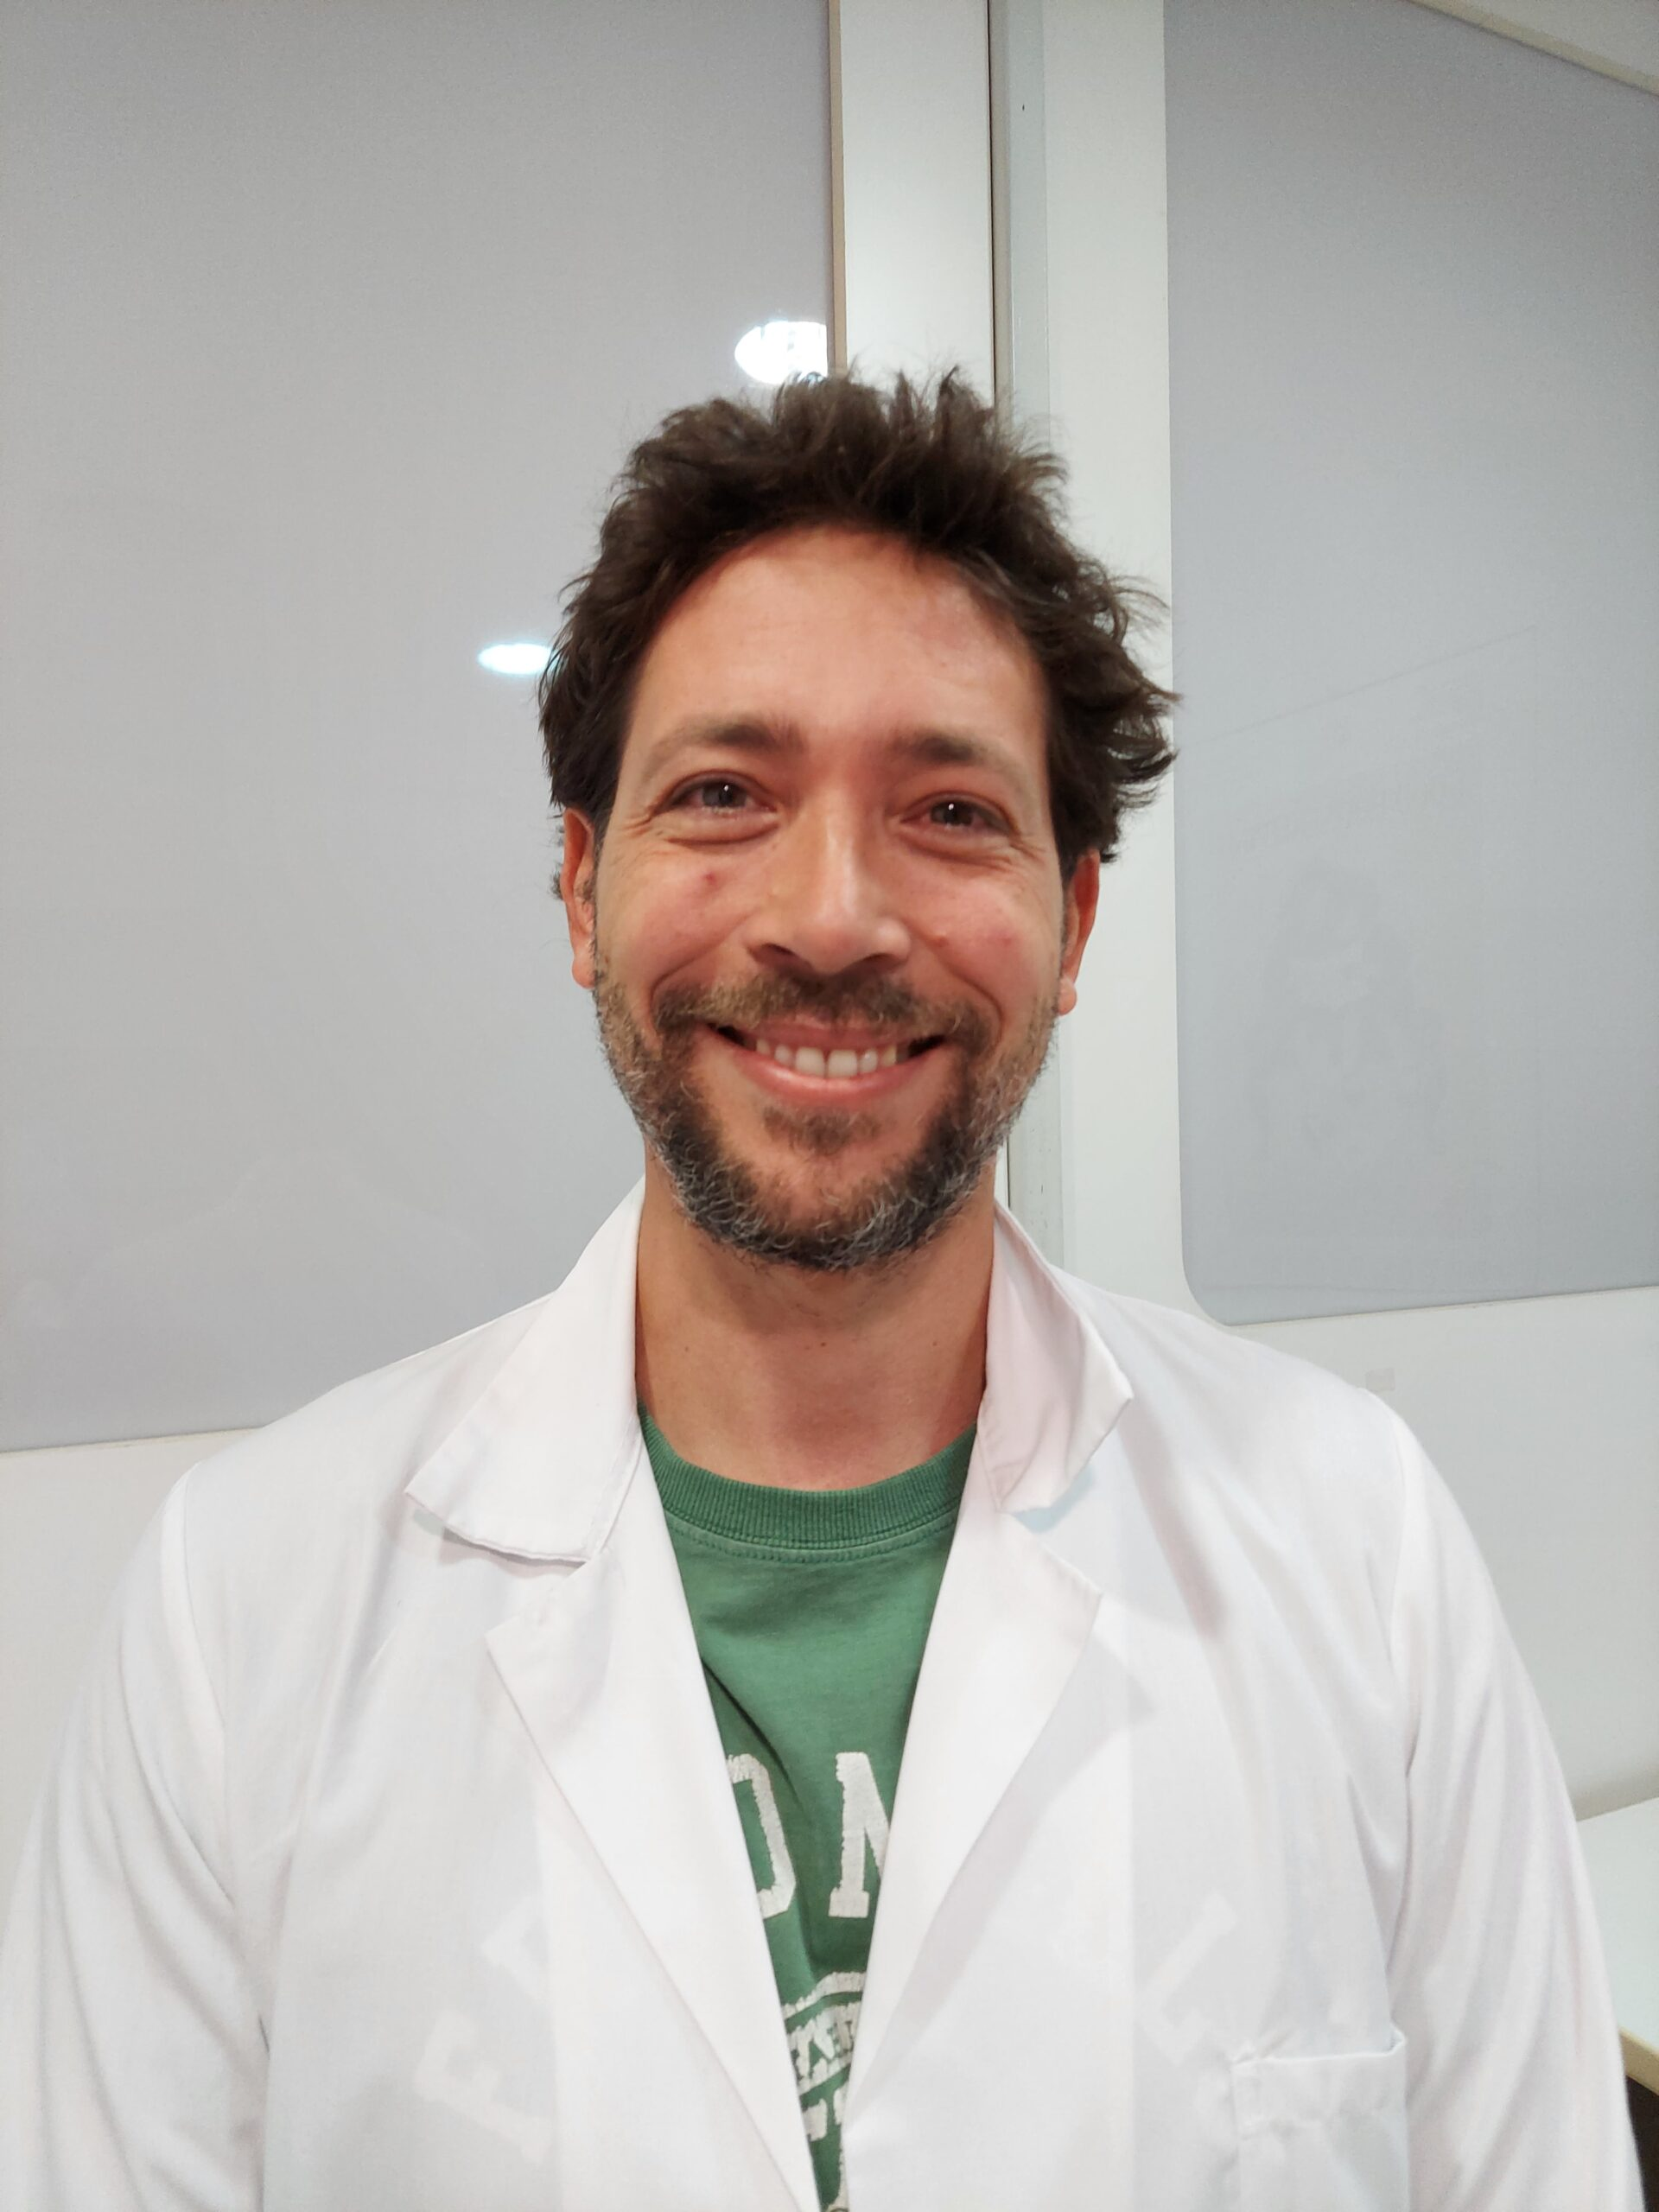 Laboratorio Analisi Multitest Livorno - Team